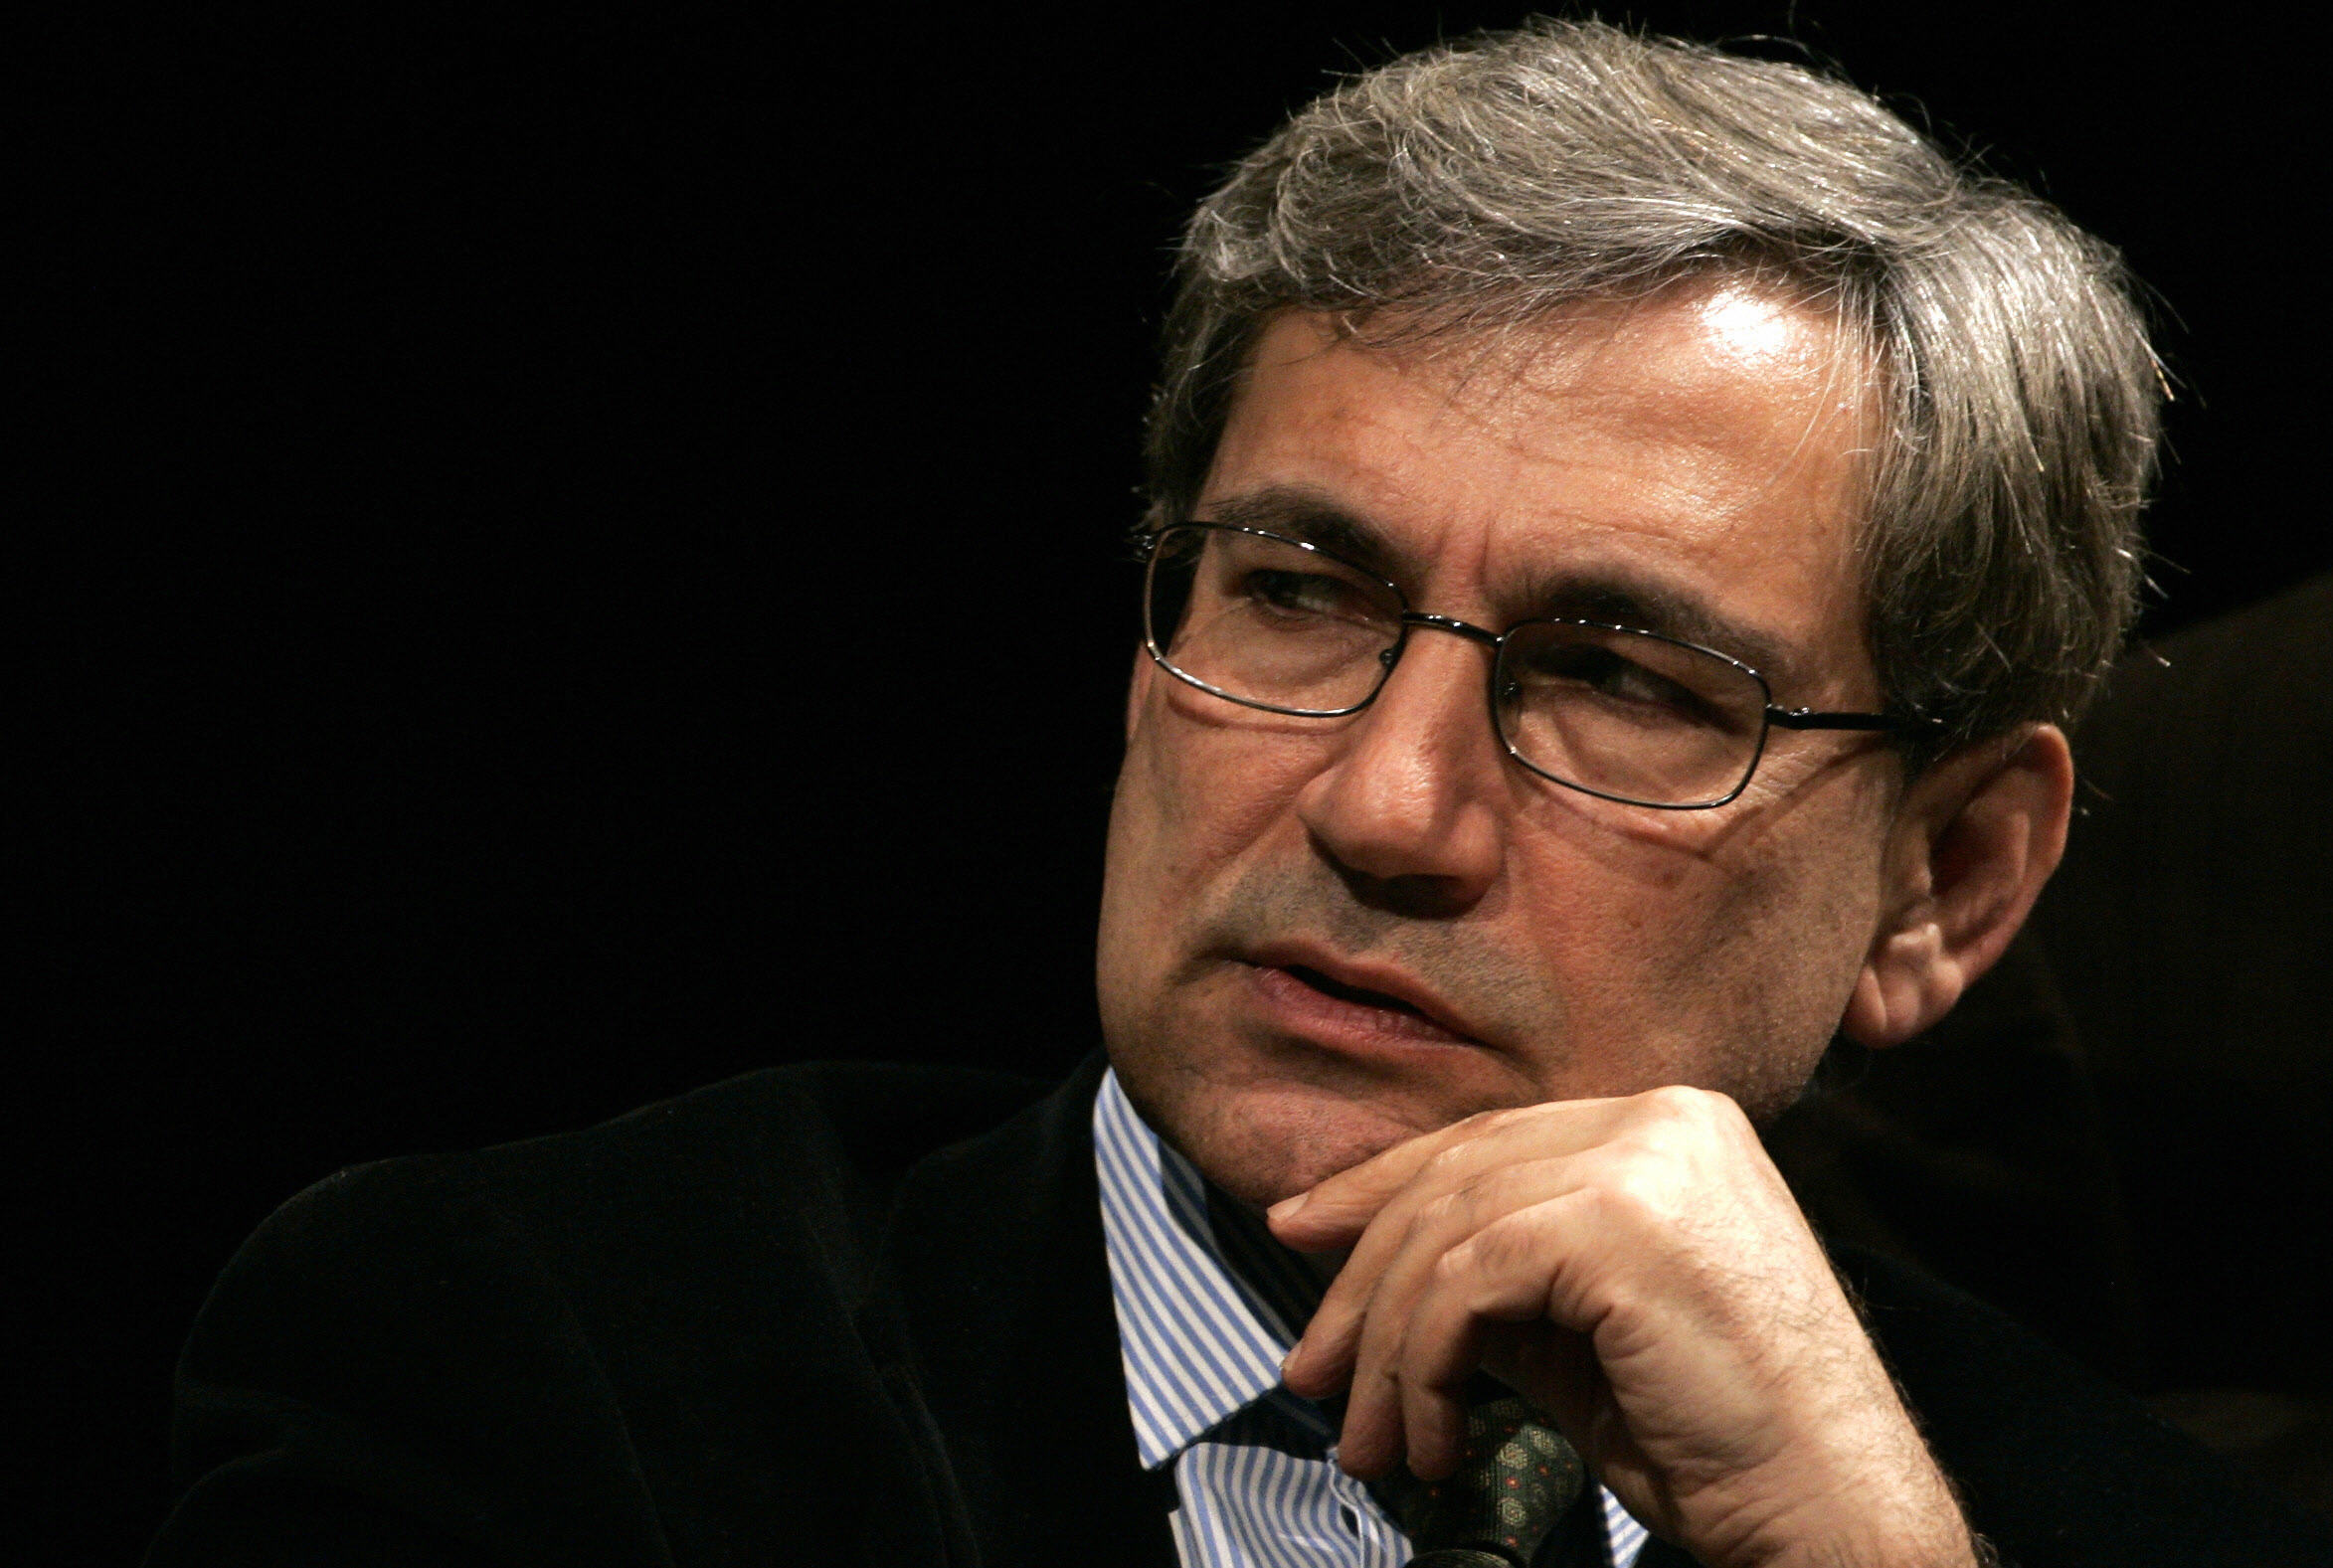 Orhan Pamuk KD39den Orhan Pamuk aklamas soL Haber Portal gne